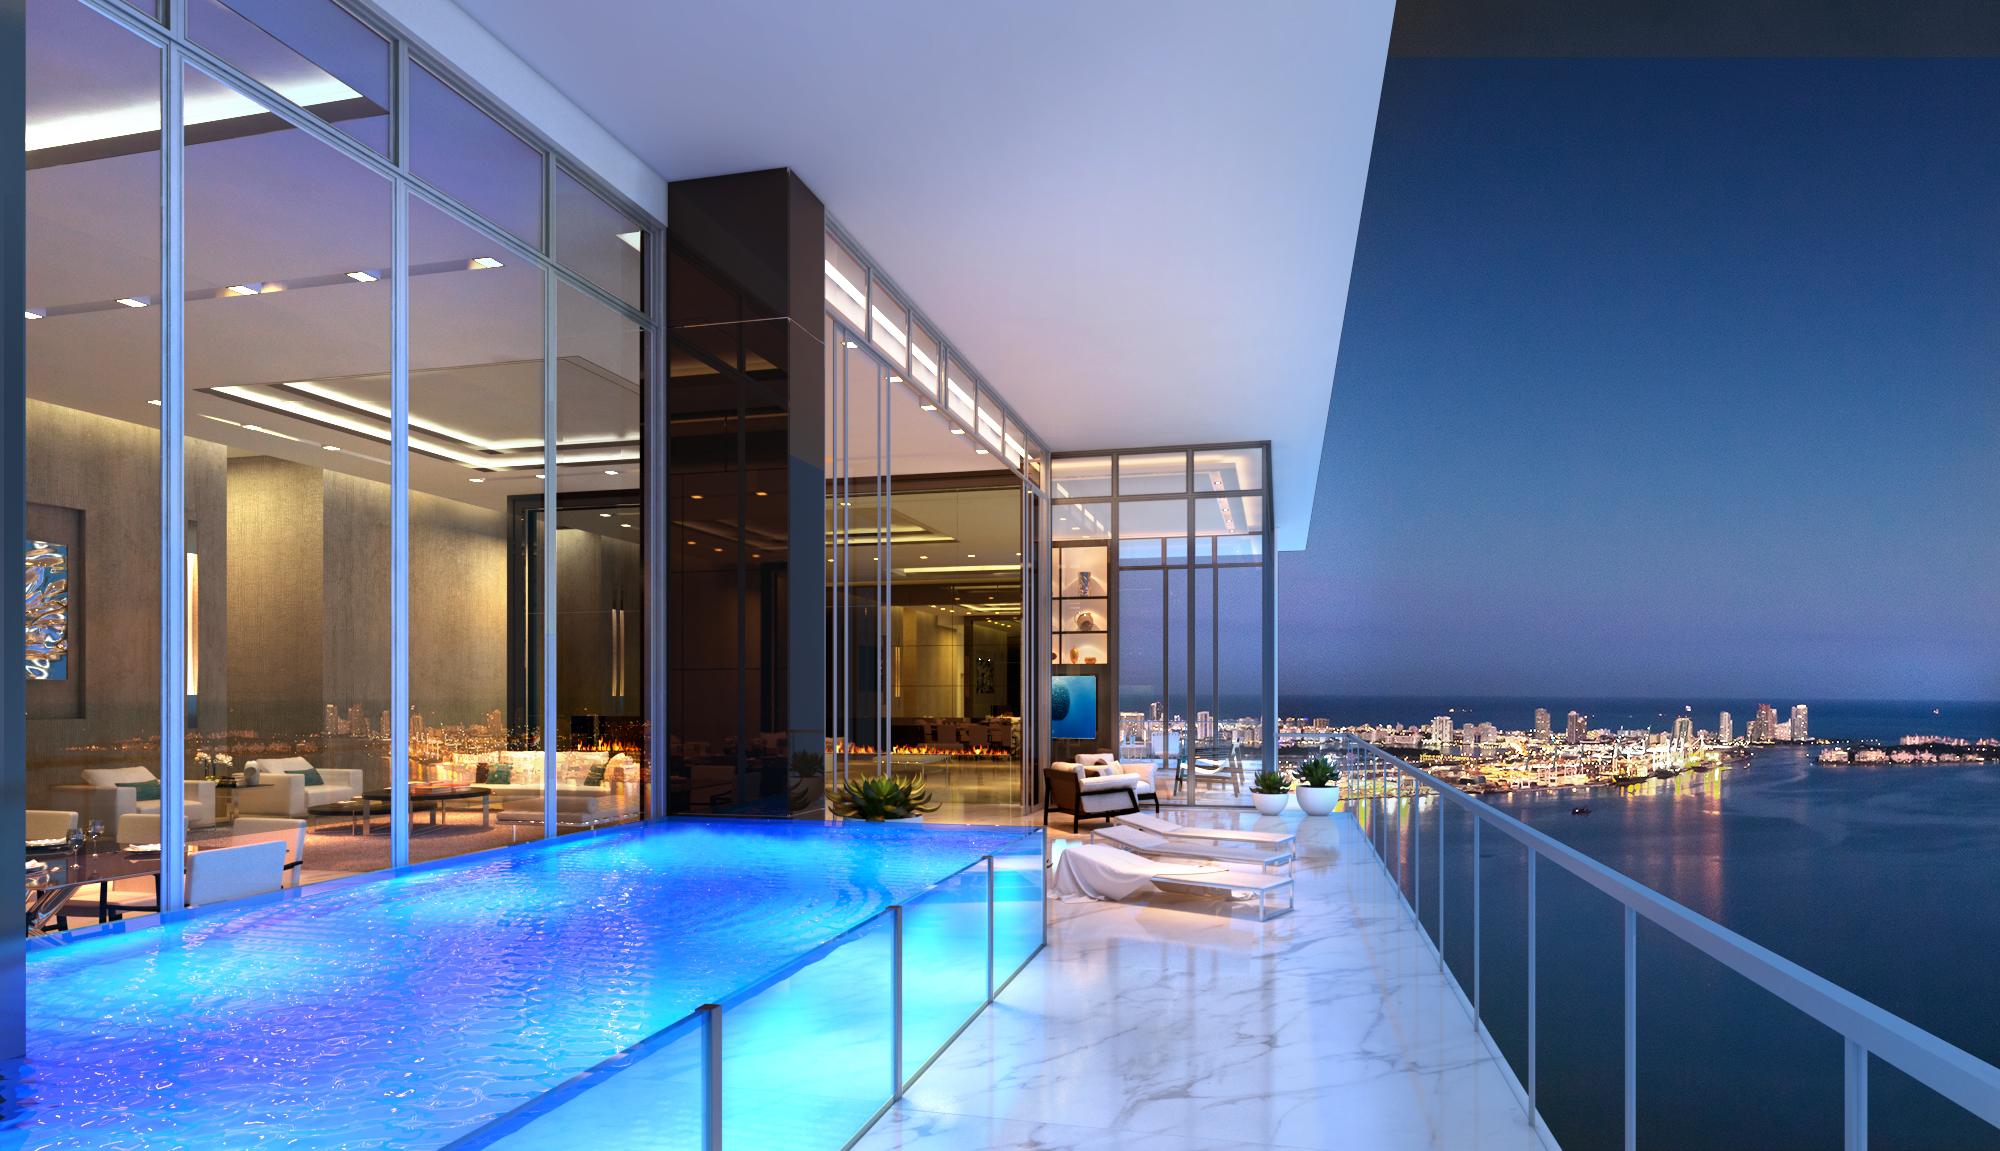 PMG-EchoBrickell-02-PentHouse-Pool-Balcony-02